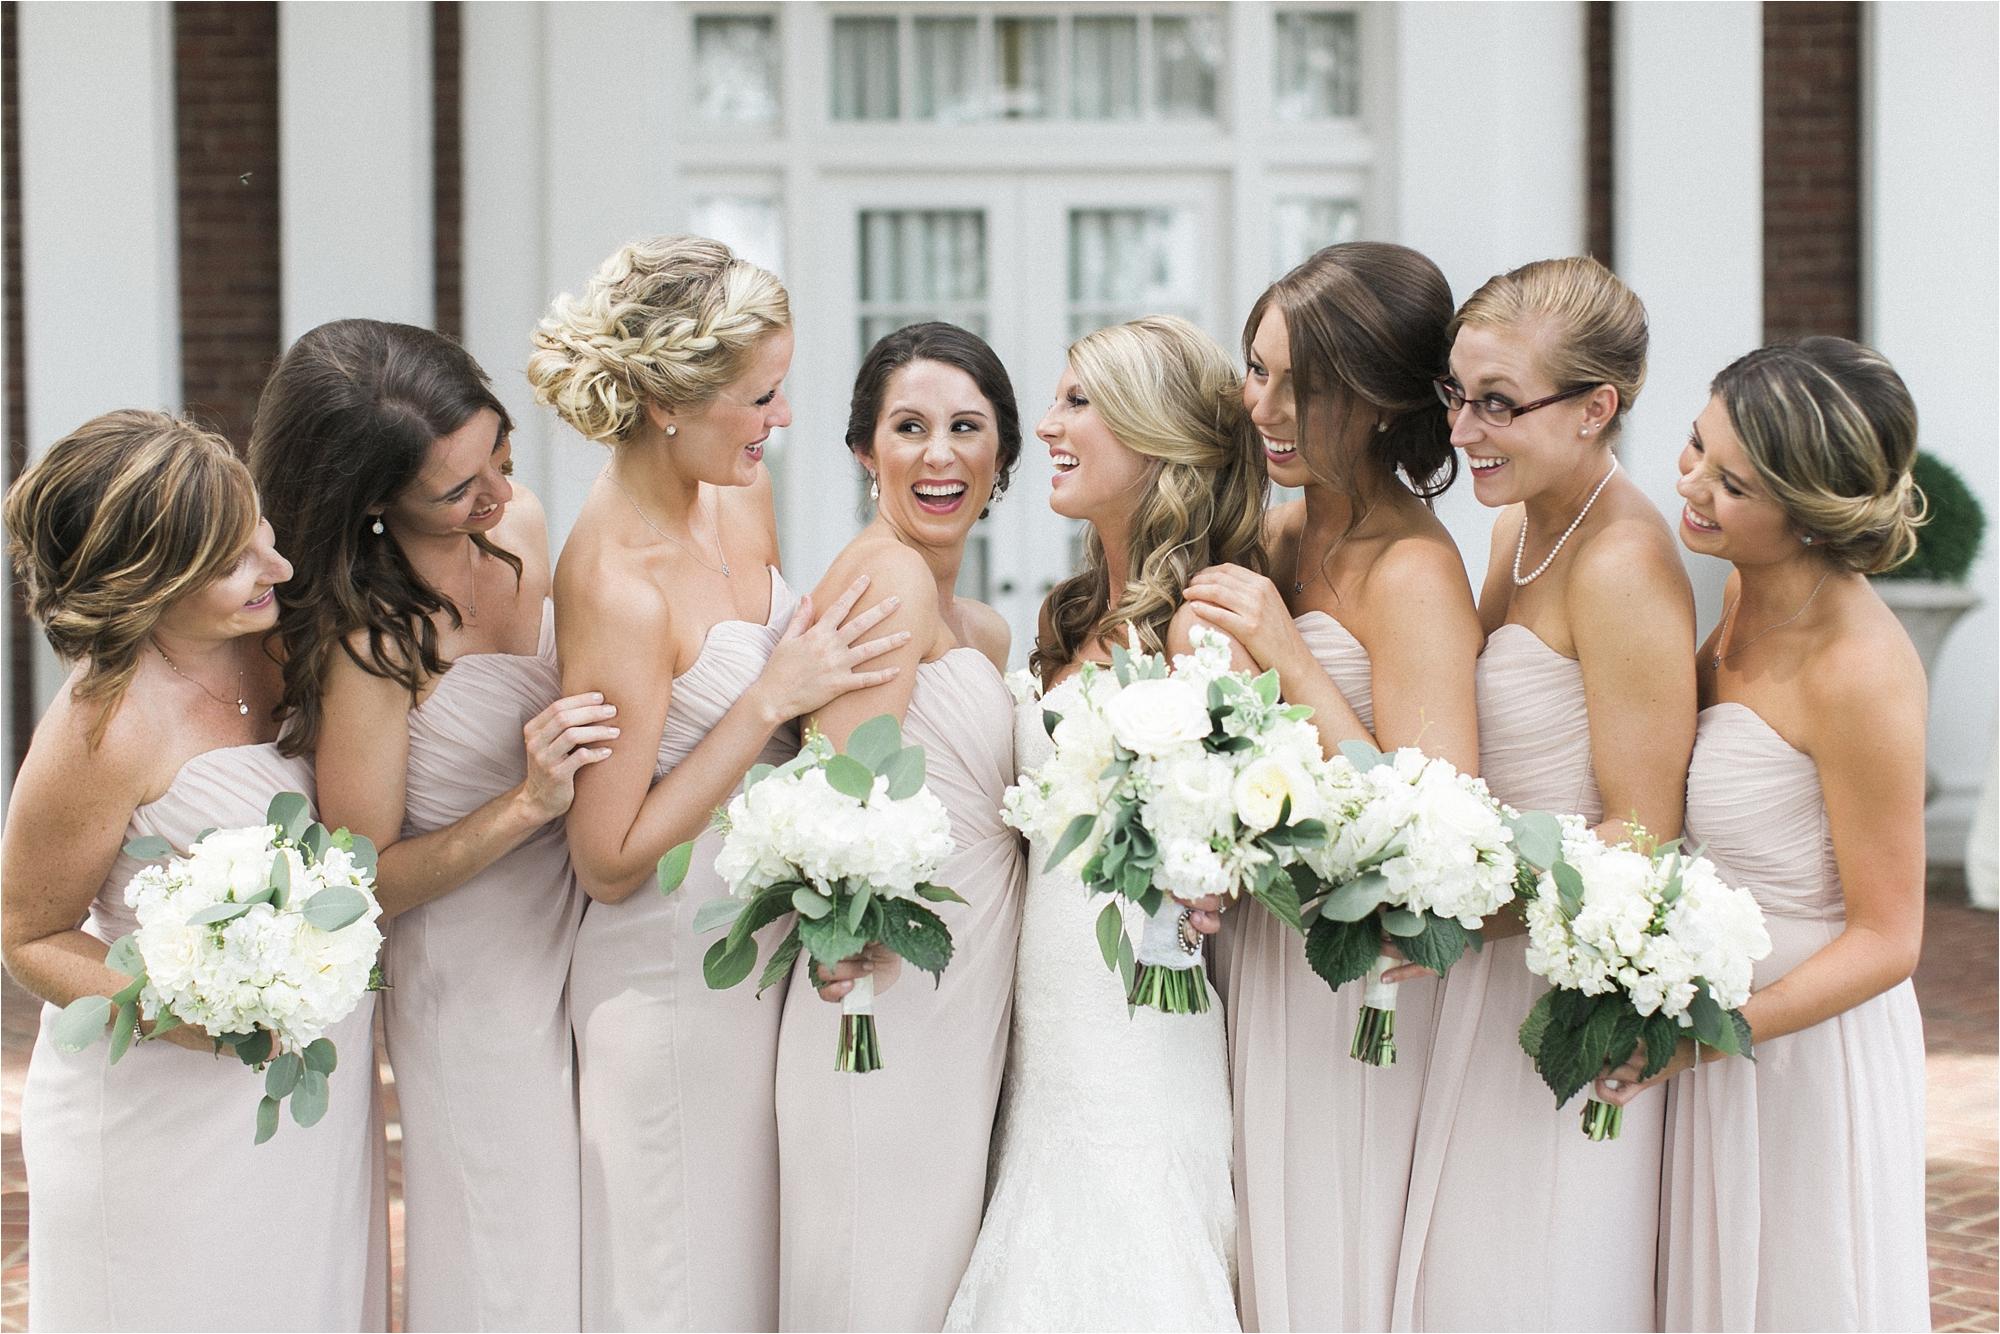 stephanie-yonce-photography-richmond-virginia-country-club-wedding_0029.jpg